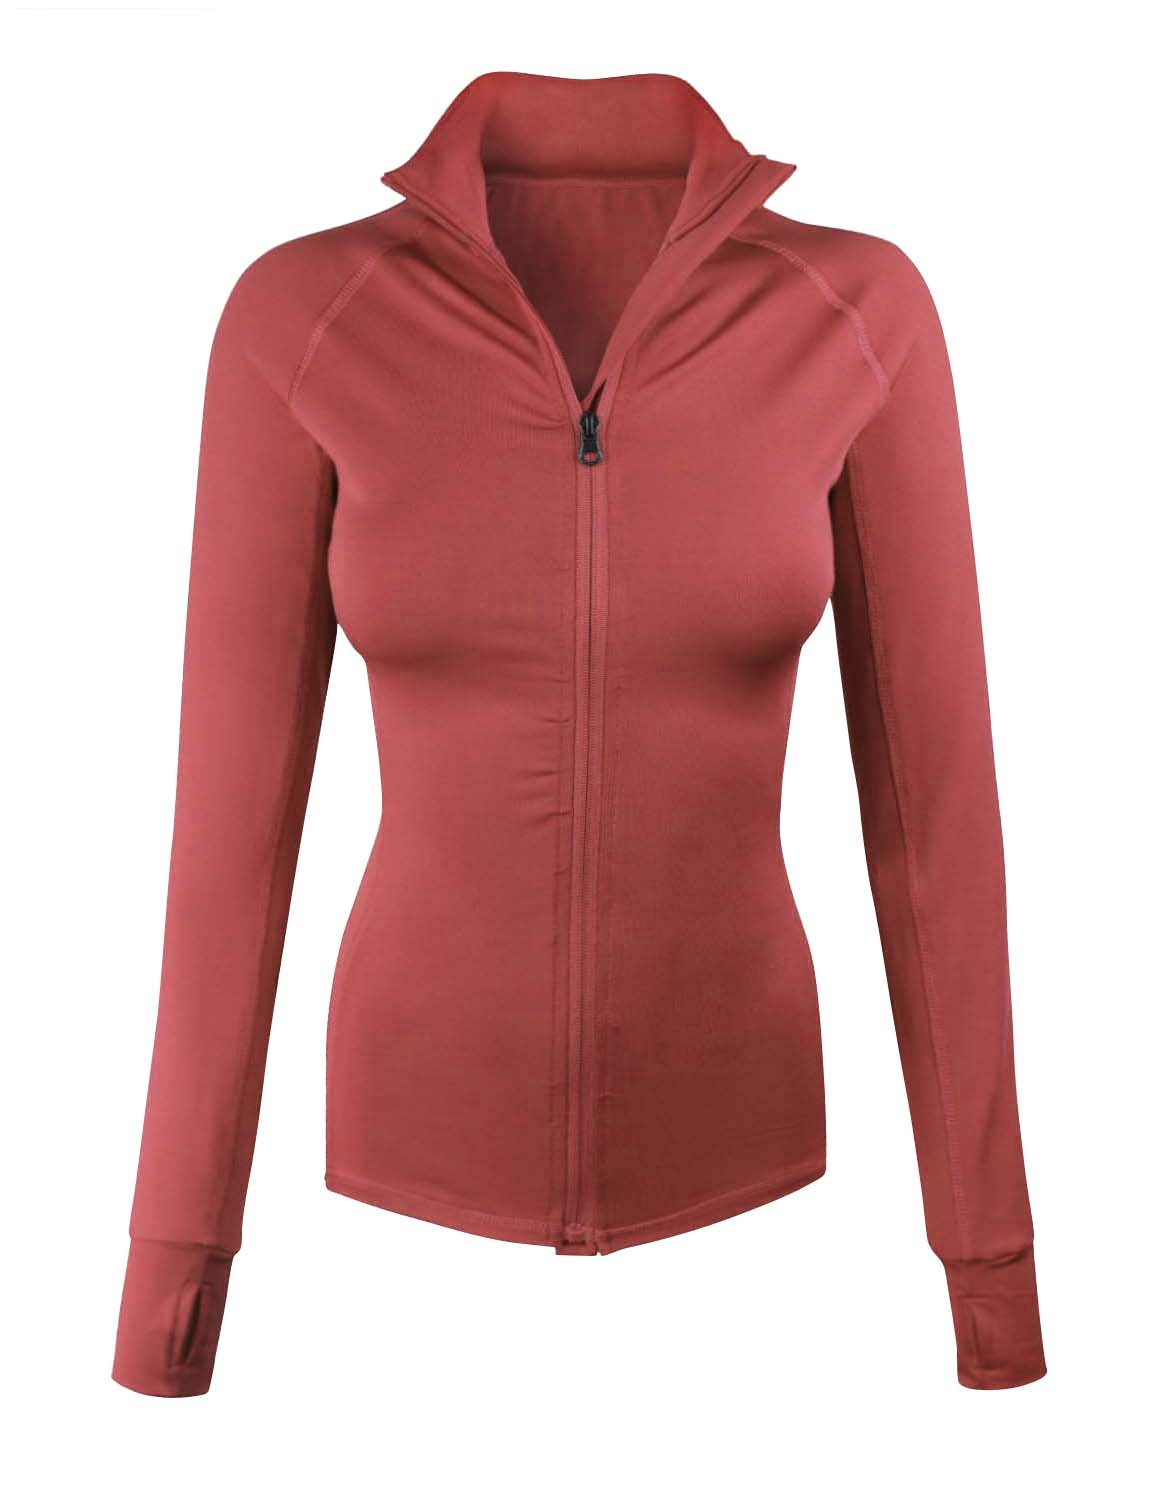 makeitmint Women's Comfy Zip up Stretchy Work Out Track Jacket w/Back Pocket Small YJZ0002_02MARSALA